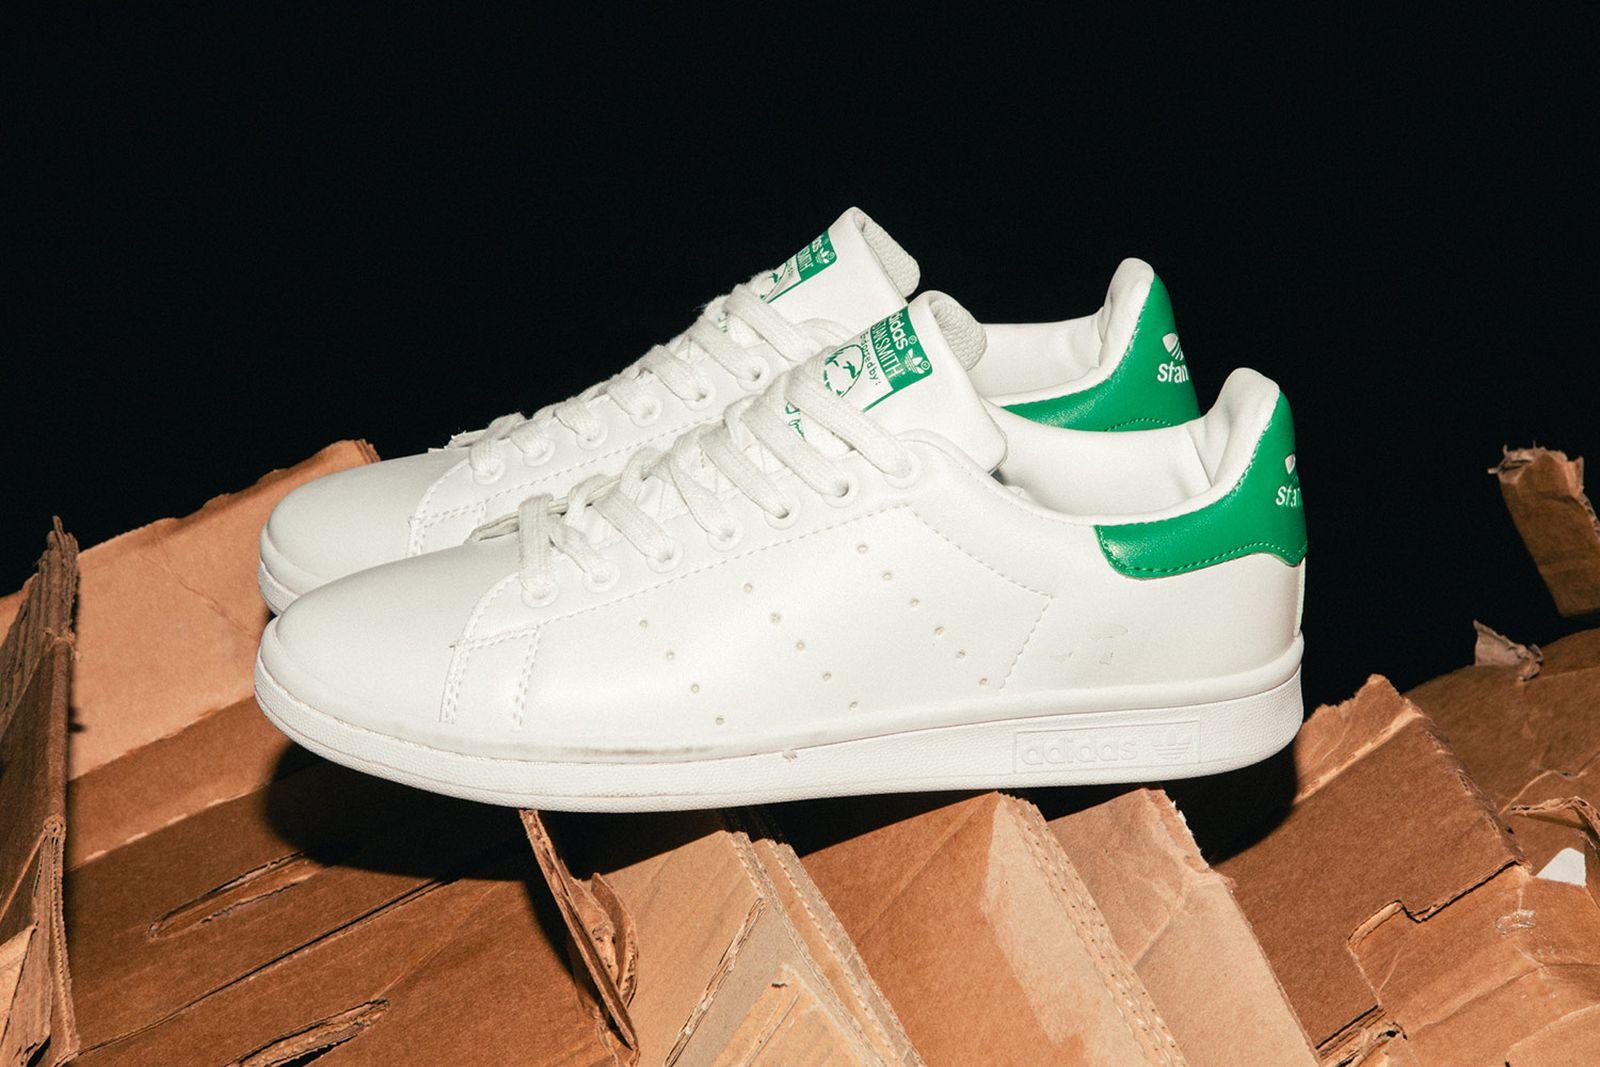 Legit-Check-Fake-Sneakers-Highsnobiety-08